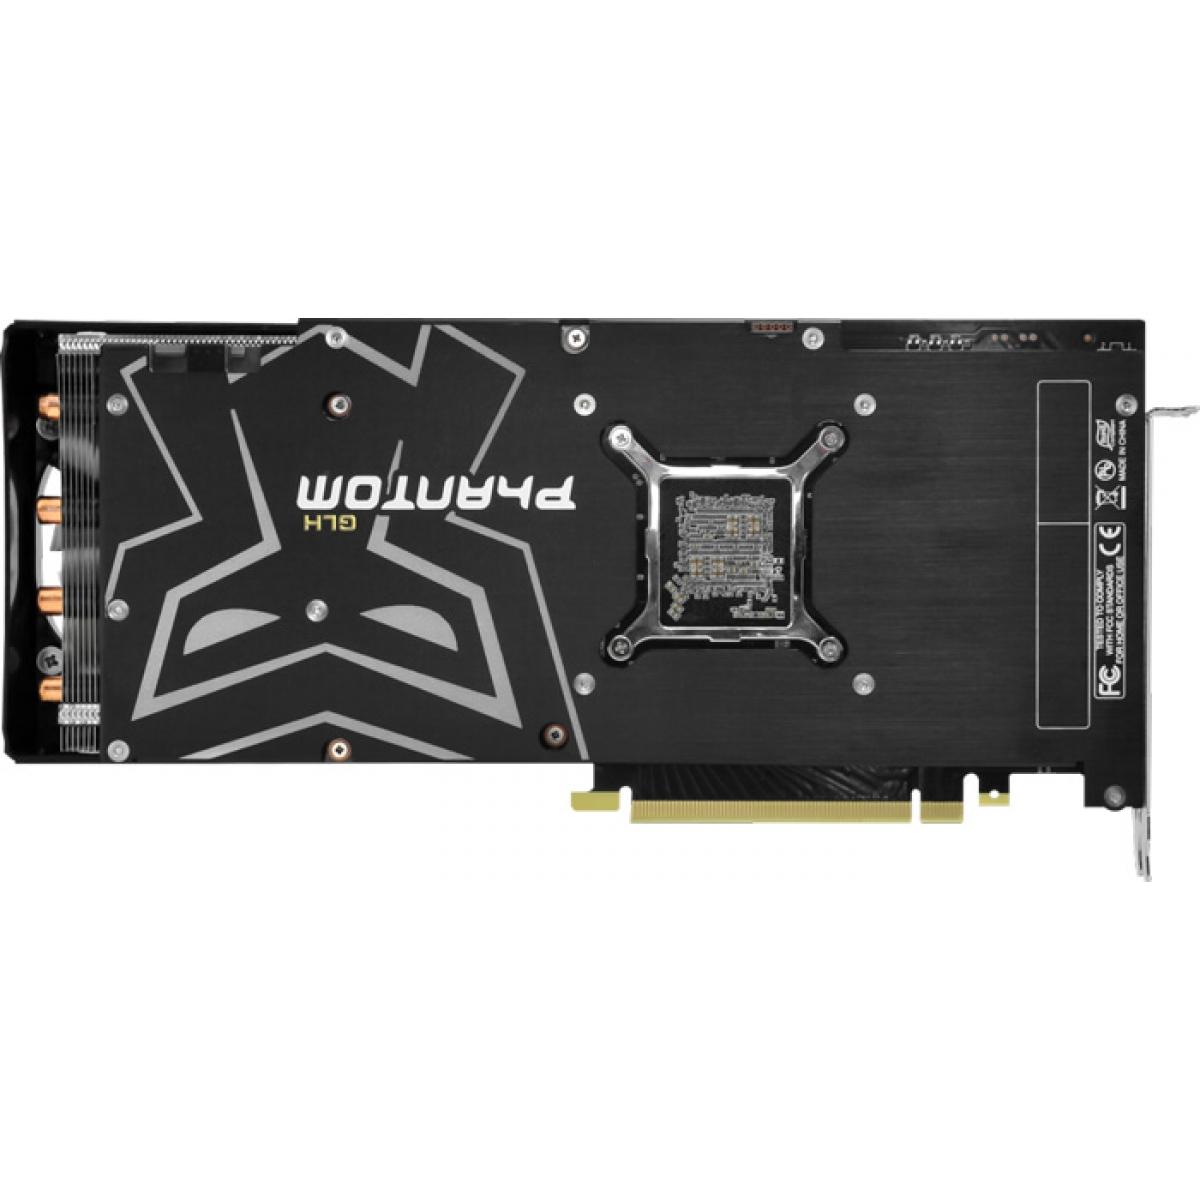 Placa De Vídeo Gainward Geforce RTX 2070 Phantom GLH (GOES LIKE HELL), 8GB GDDR6, 256Bit